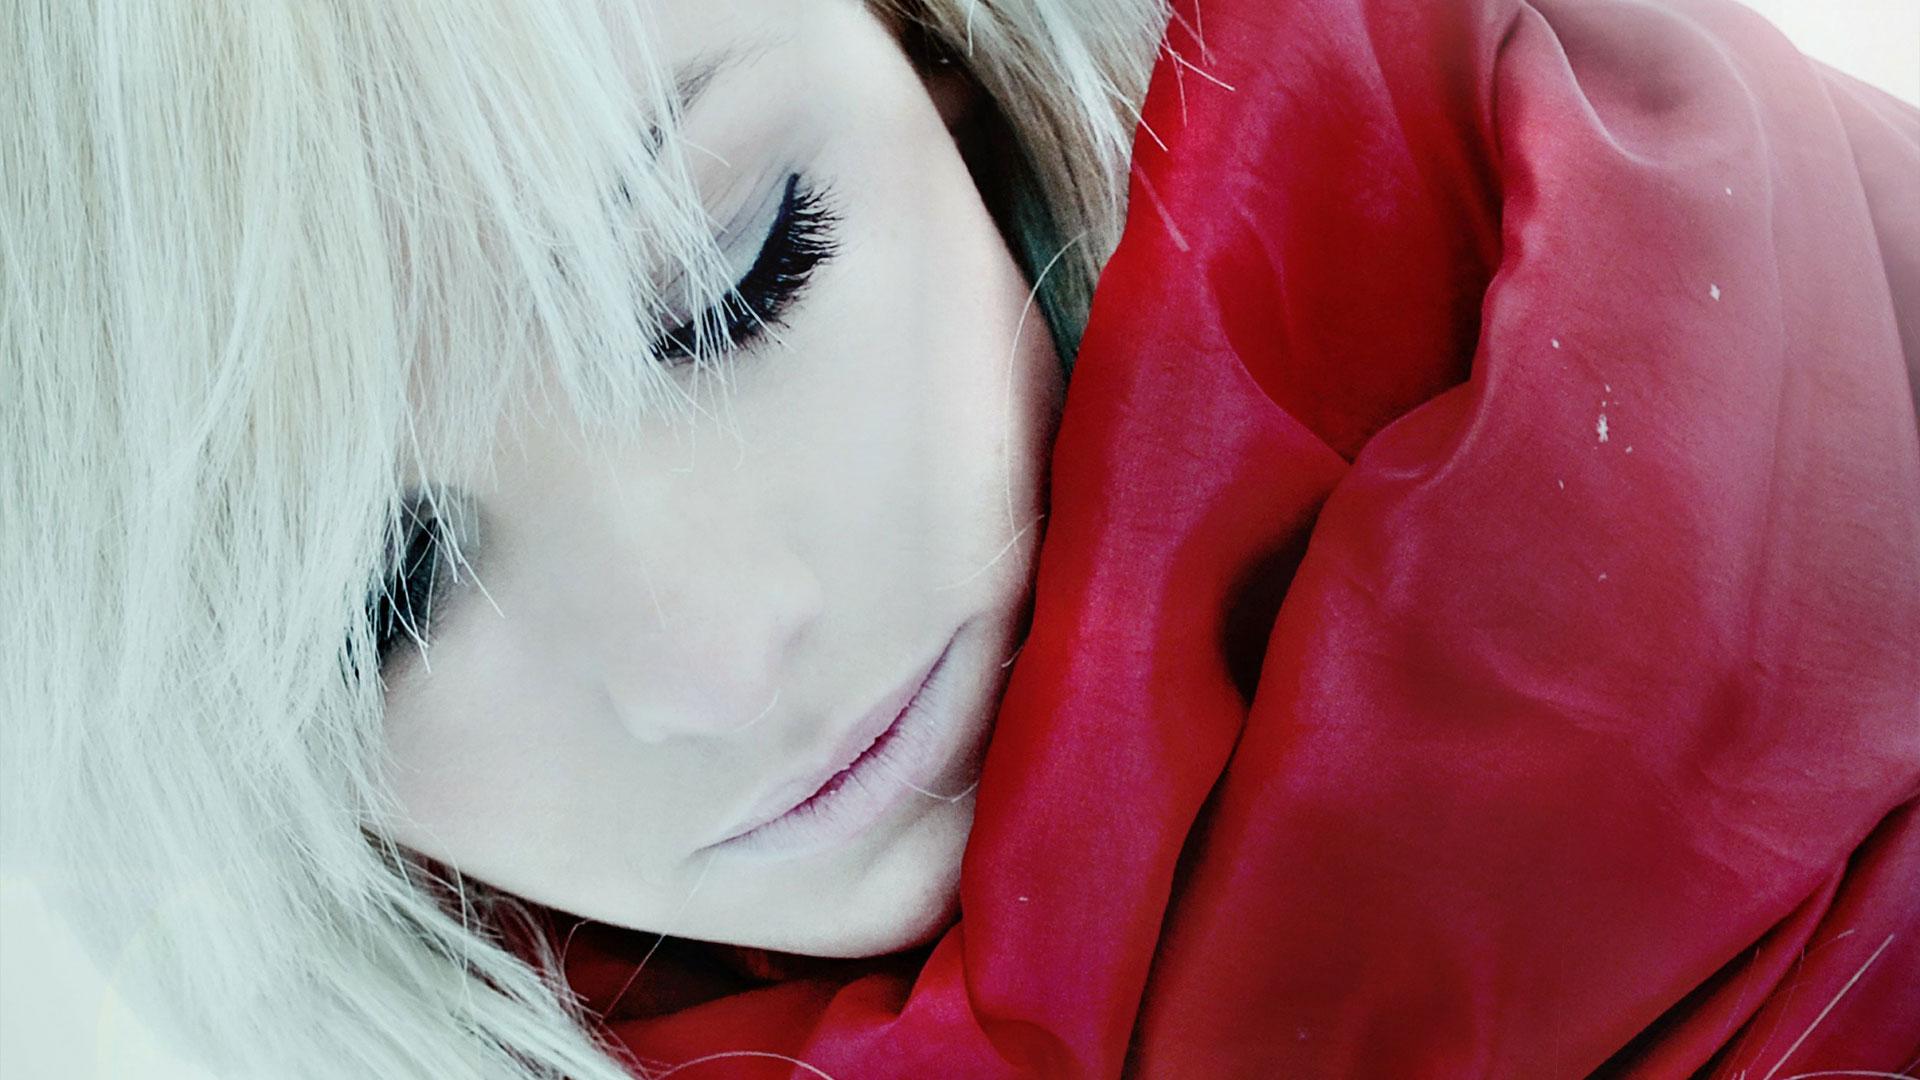 Фото девушки с короткой стрижкой зимой